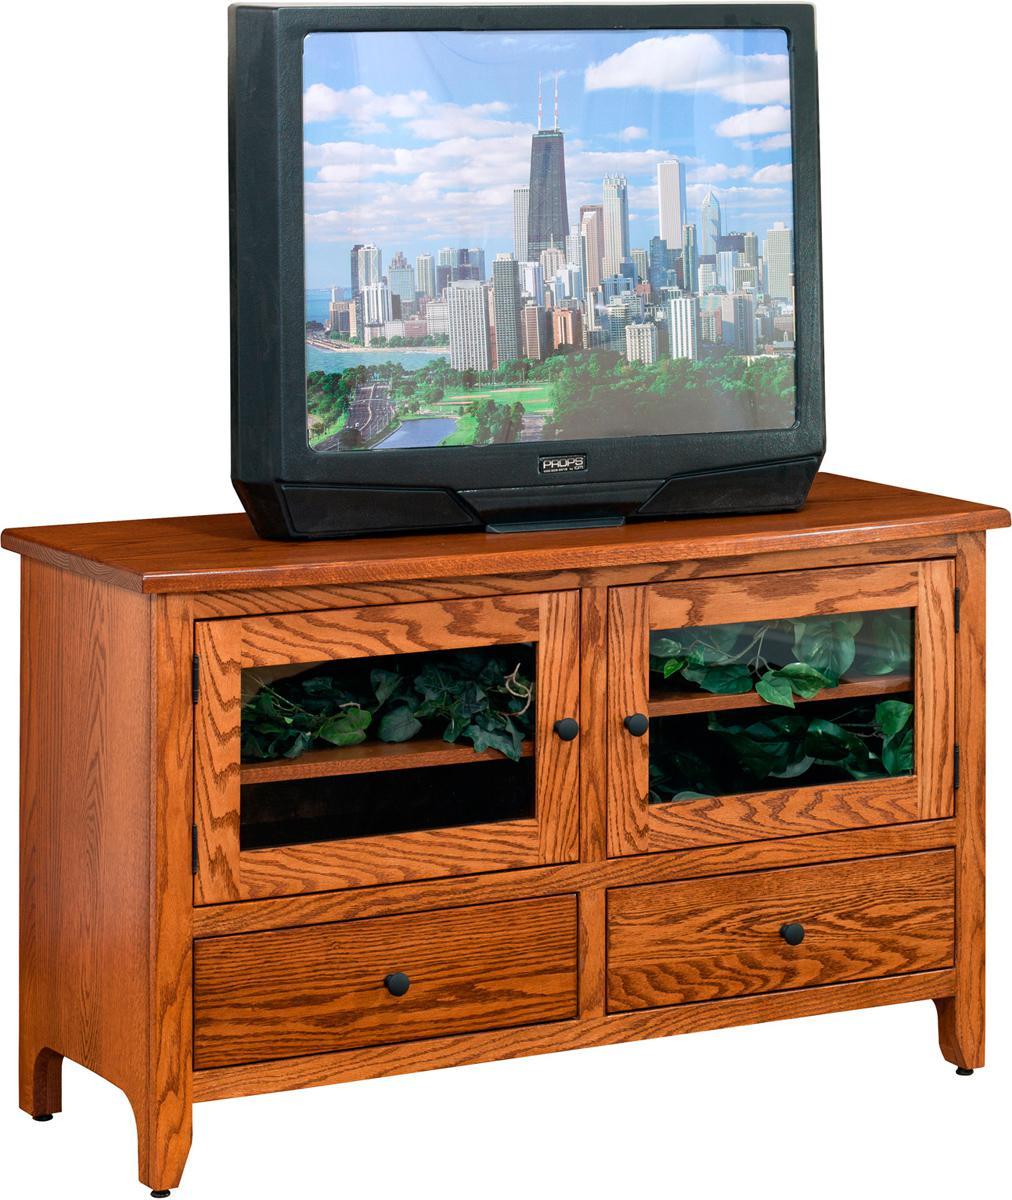 Shaker Economy TV Stand